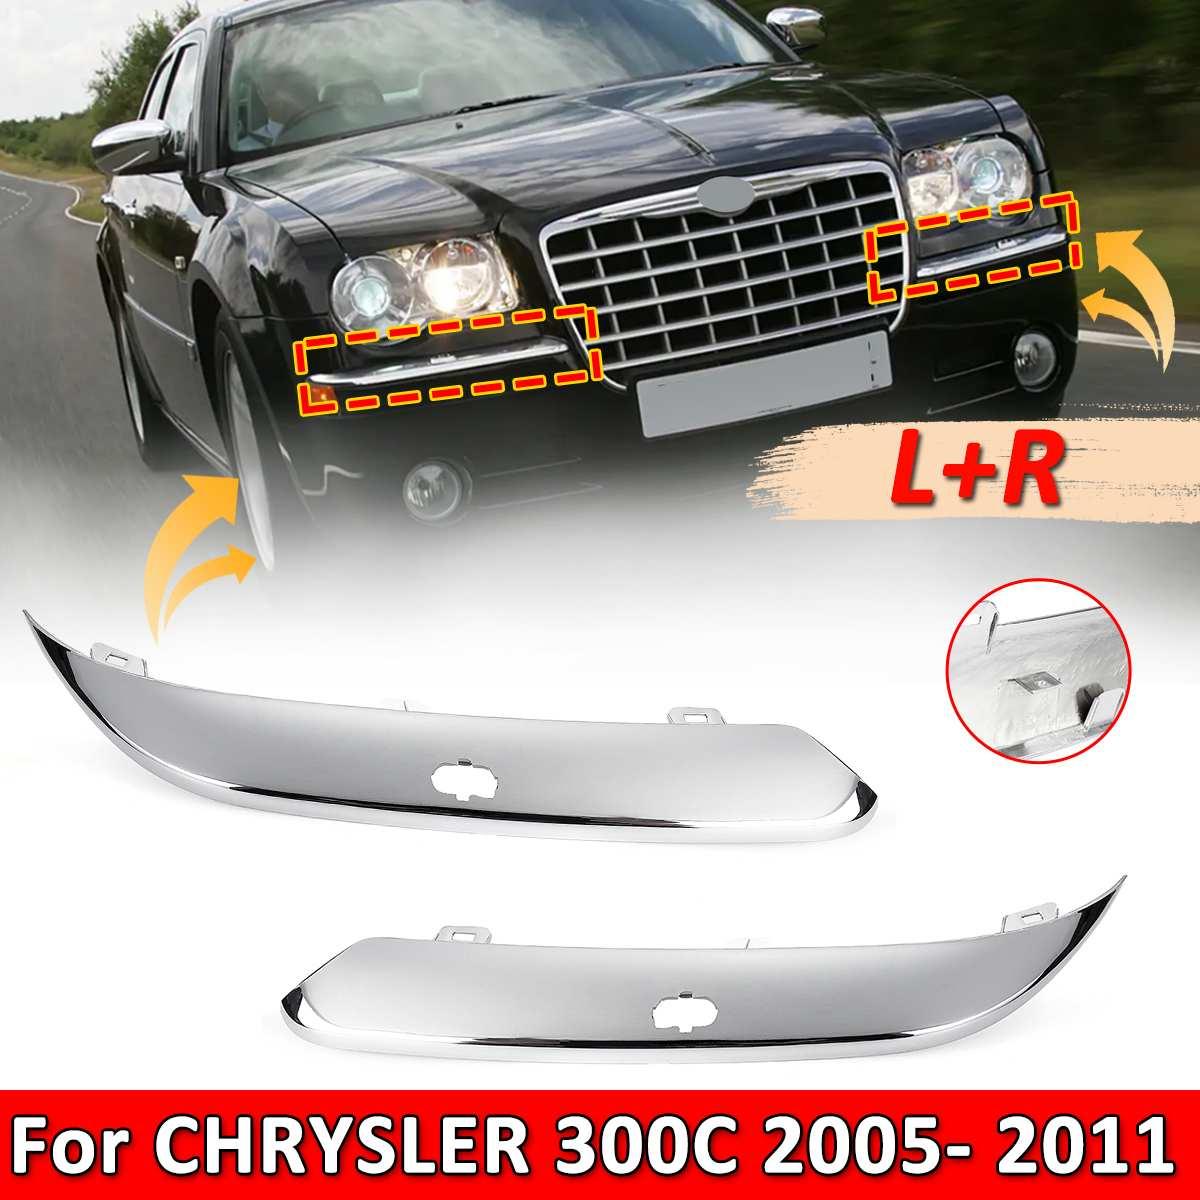 L + R coche ABS cromado parachoques delantero Foglight cubierta parachoques borde Protector tira para CHRYSLER 300C 2005-2011